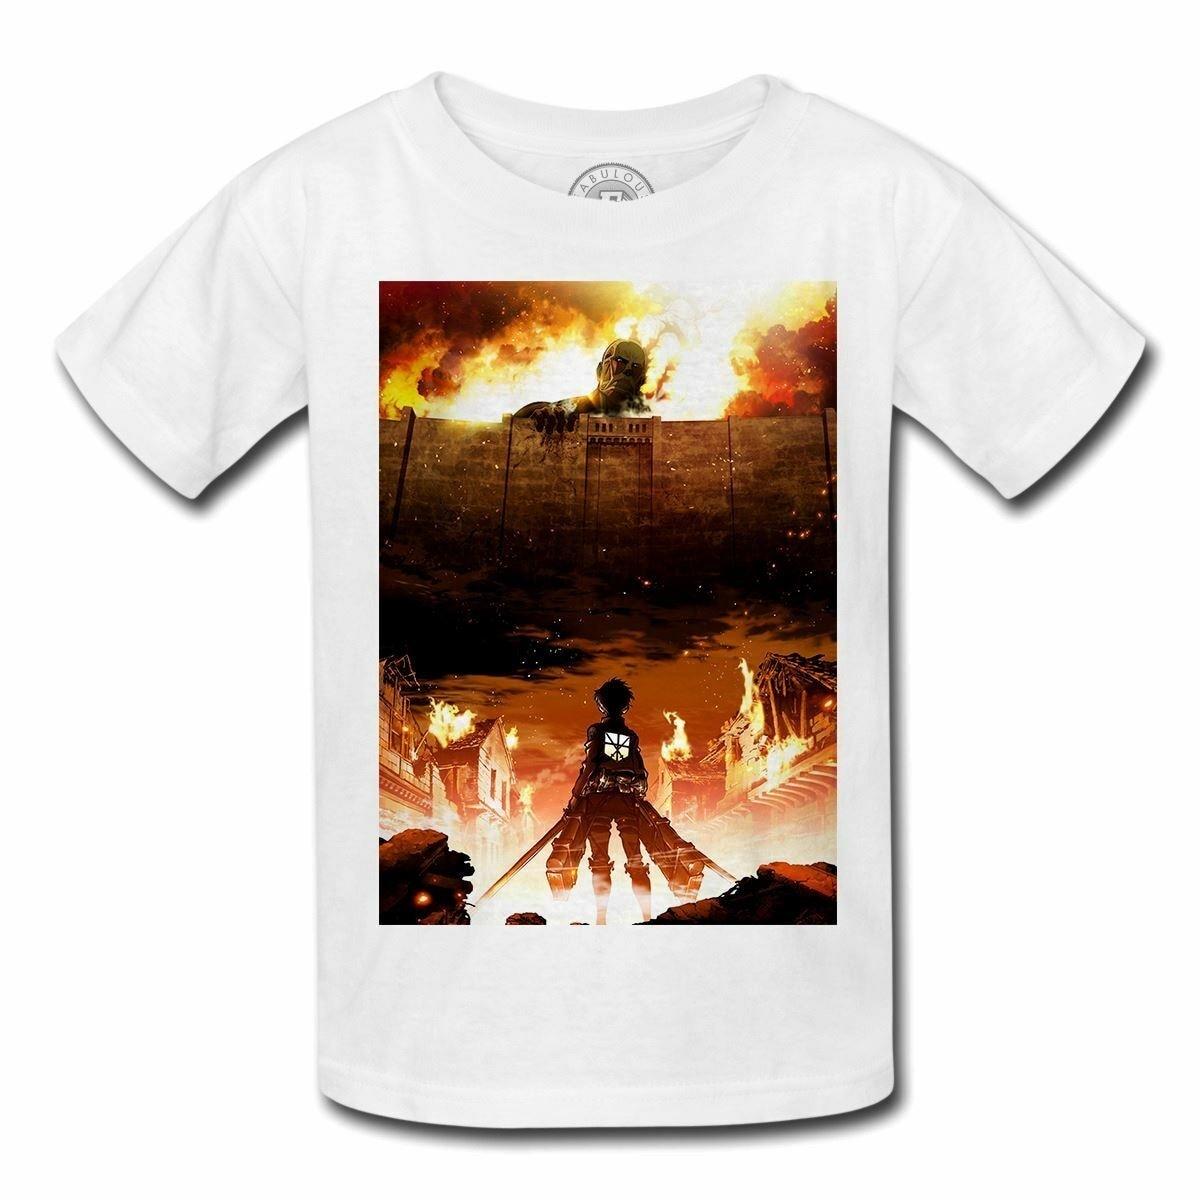 Camiseta enfant attaque des titants shingeki nenhum kyojin mangá japon monstres